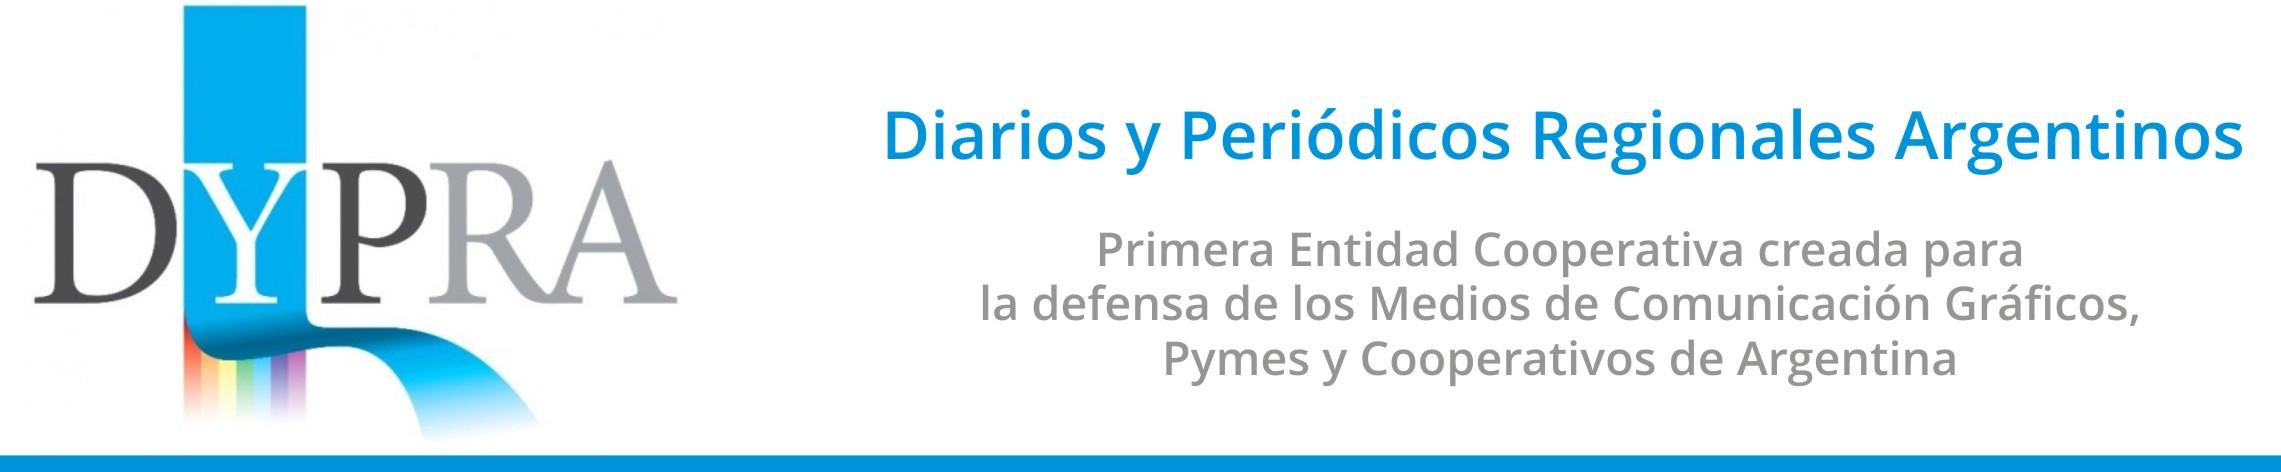 DyPRA